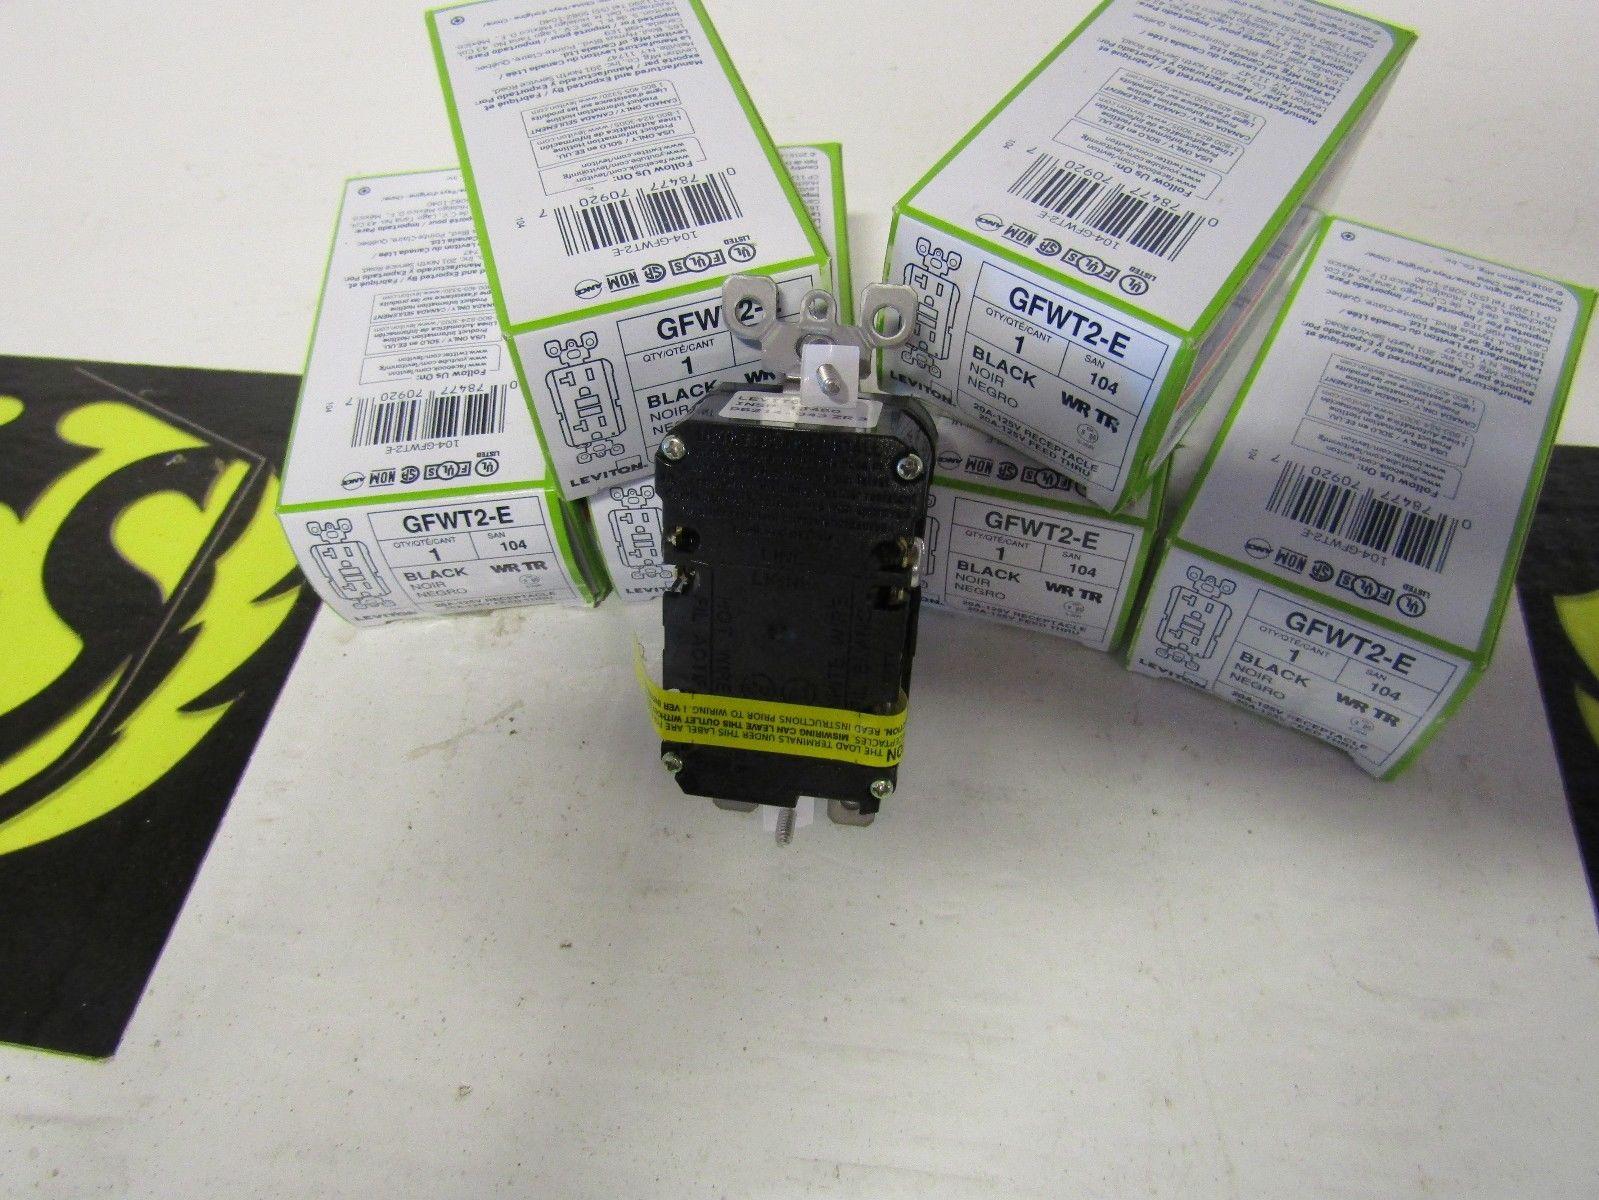 LEVITON GFWT2-E 20 AMP 125 VOLT WR TR BLACK RECEPTACLE   Powered ...